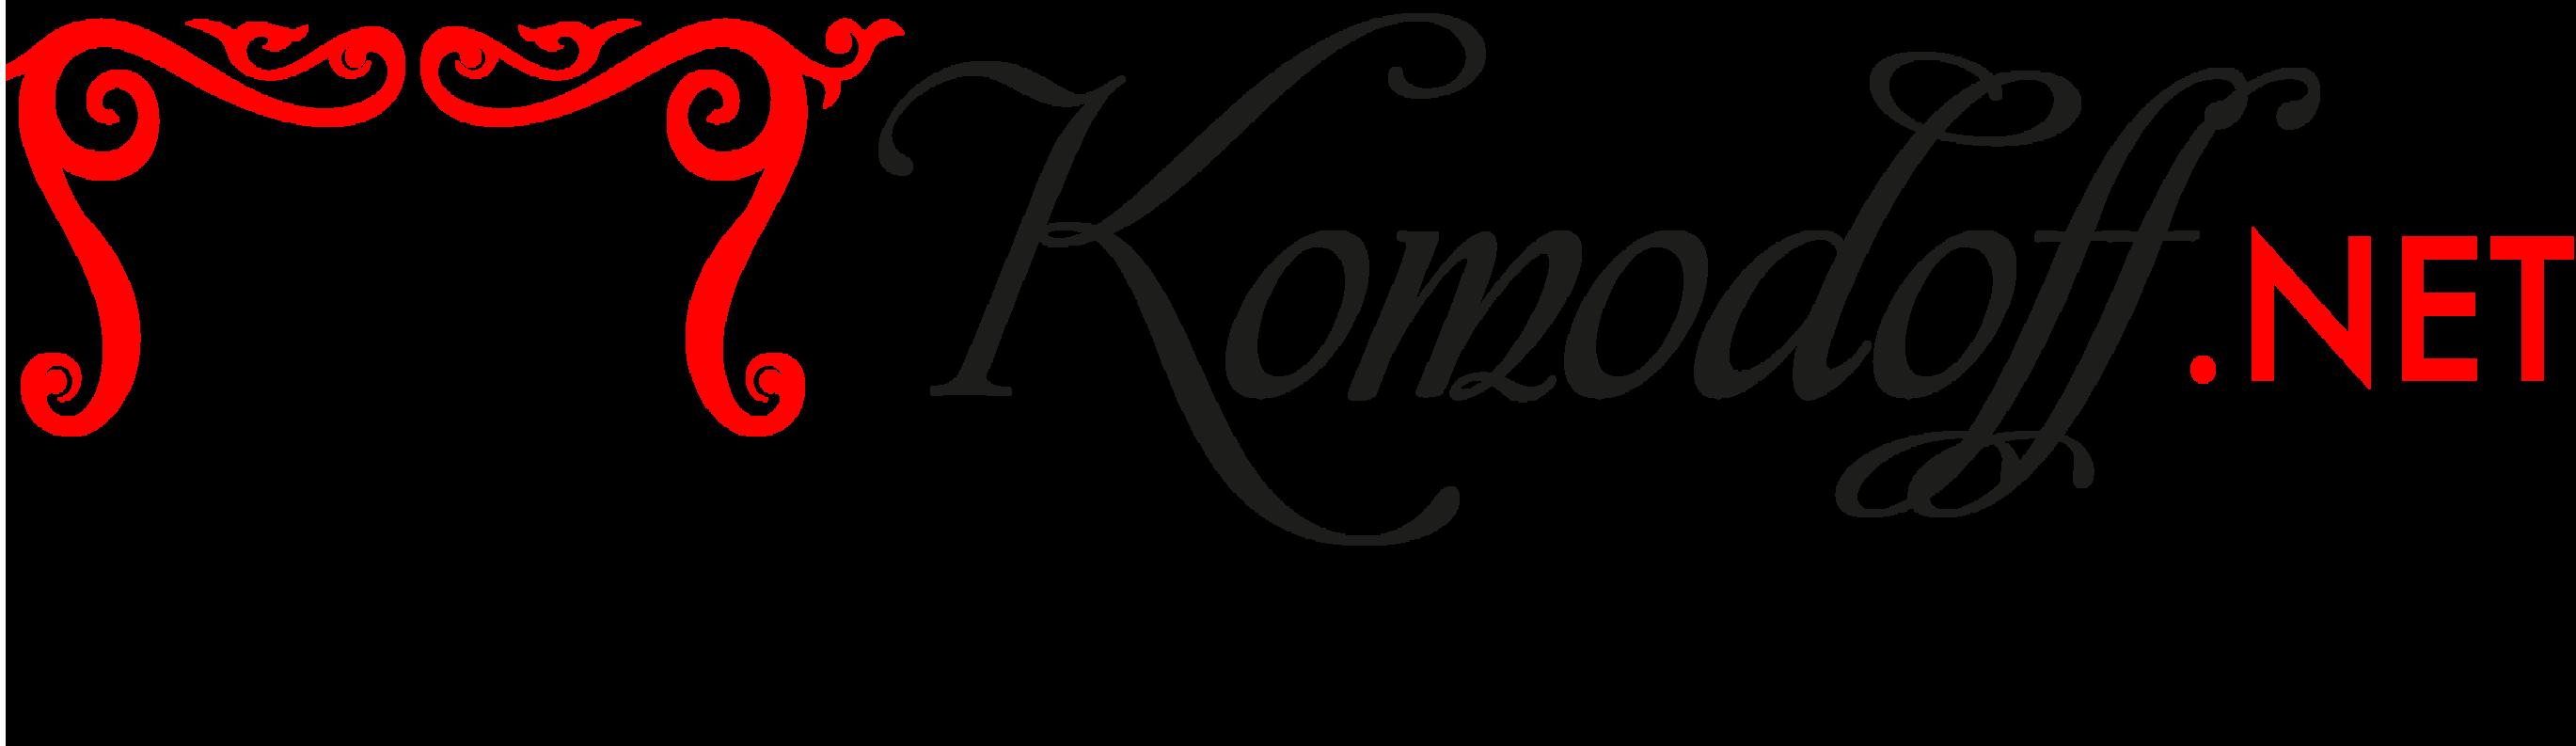 КОМОДОФФ. нет